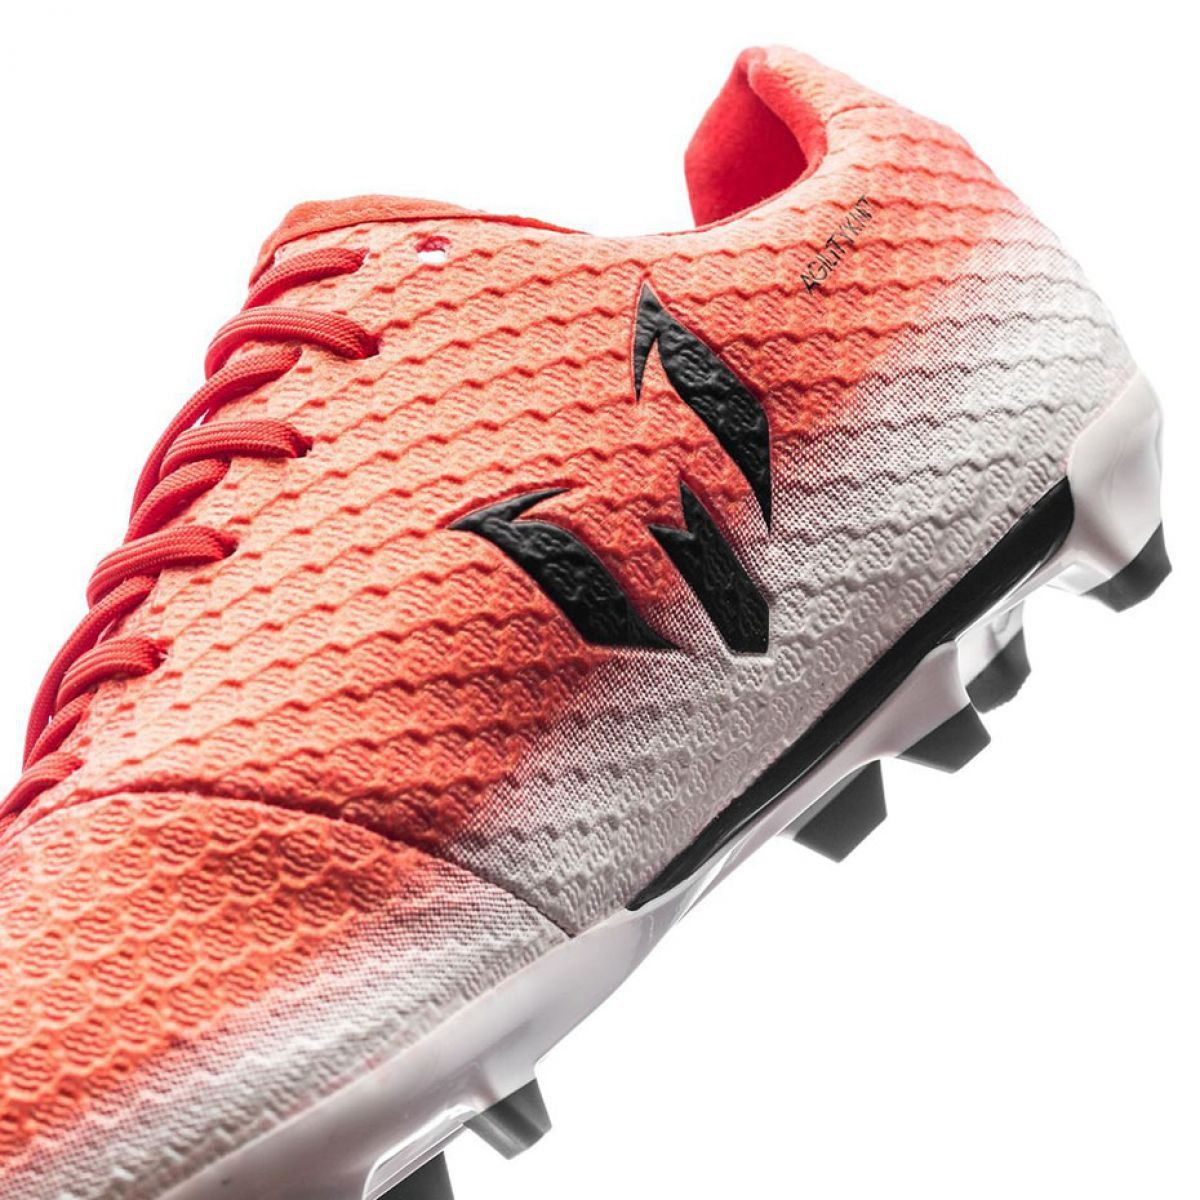 Fußballschuhe adidas Messi 16.1 FG Red | Sportega.at